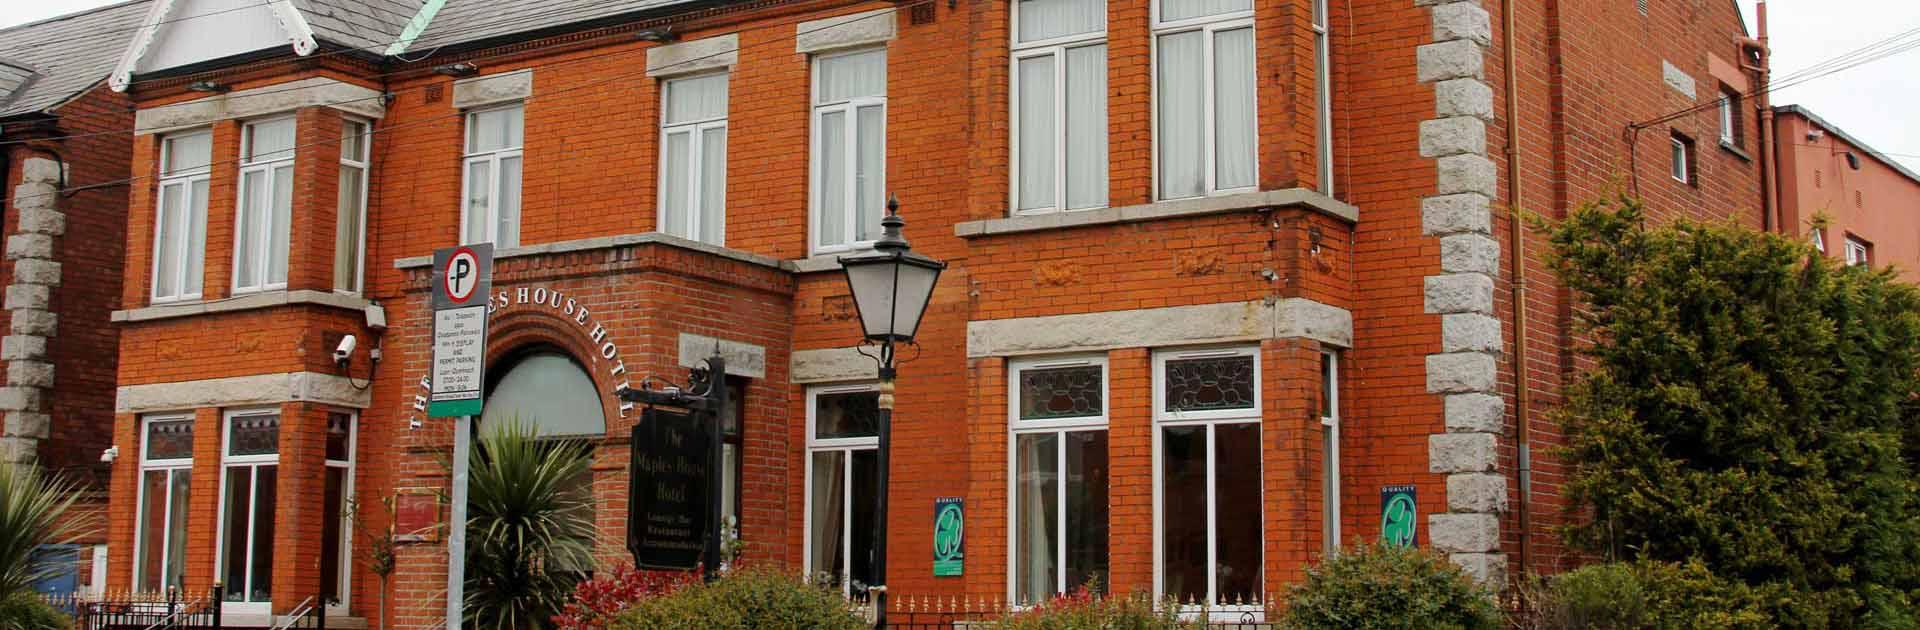 Official Website Glasnevin Dublin 9 Hotel, Cheap Weddings